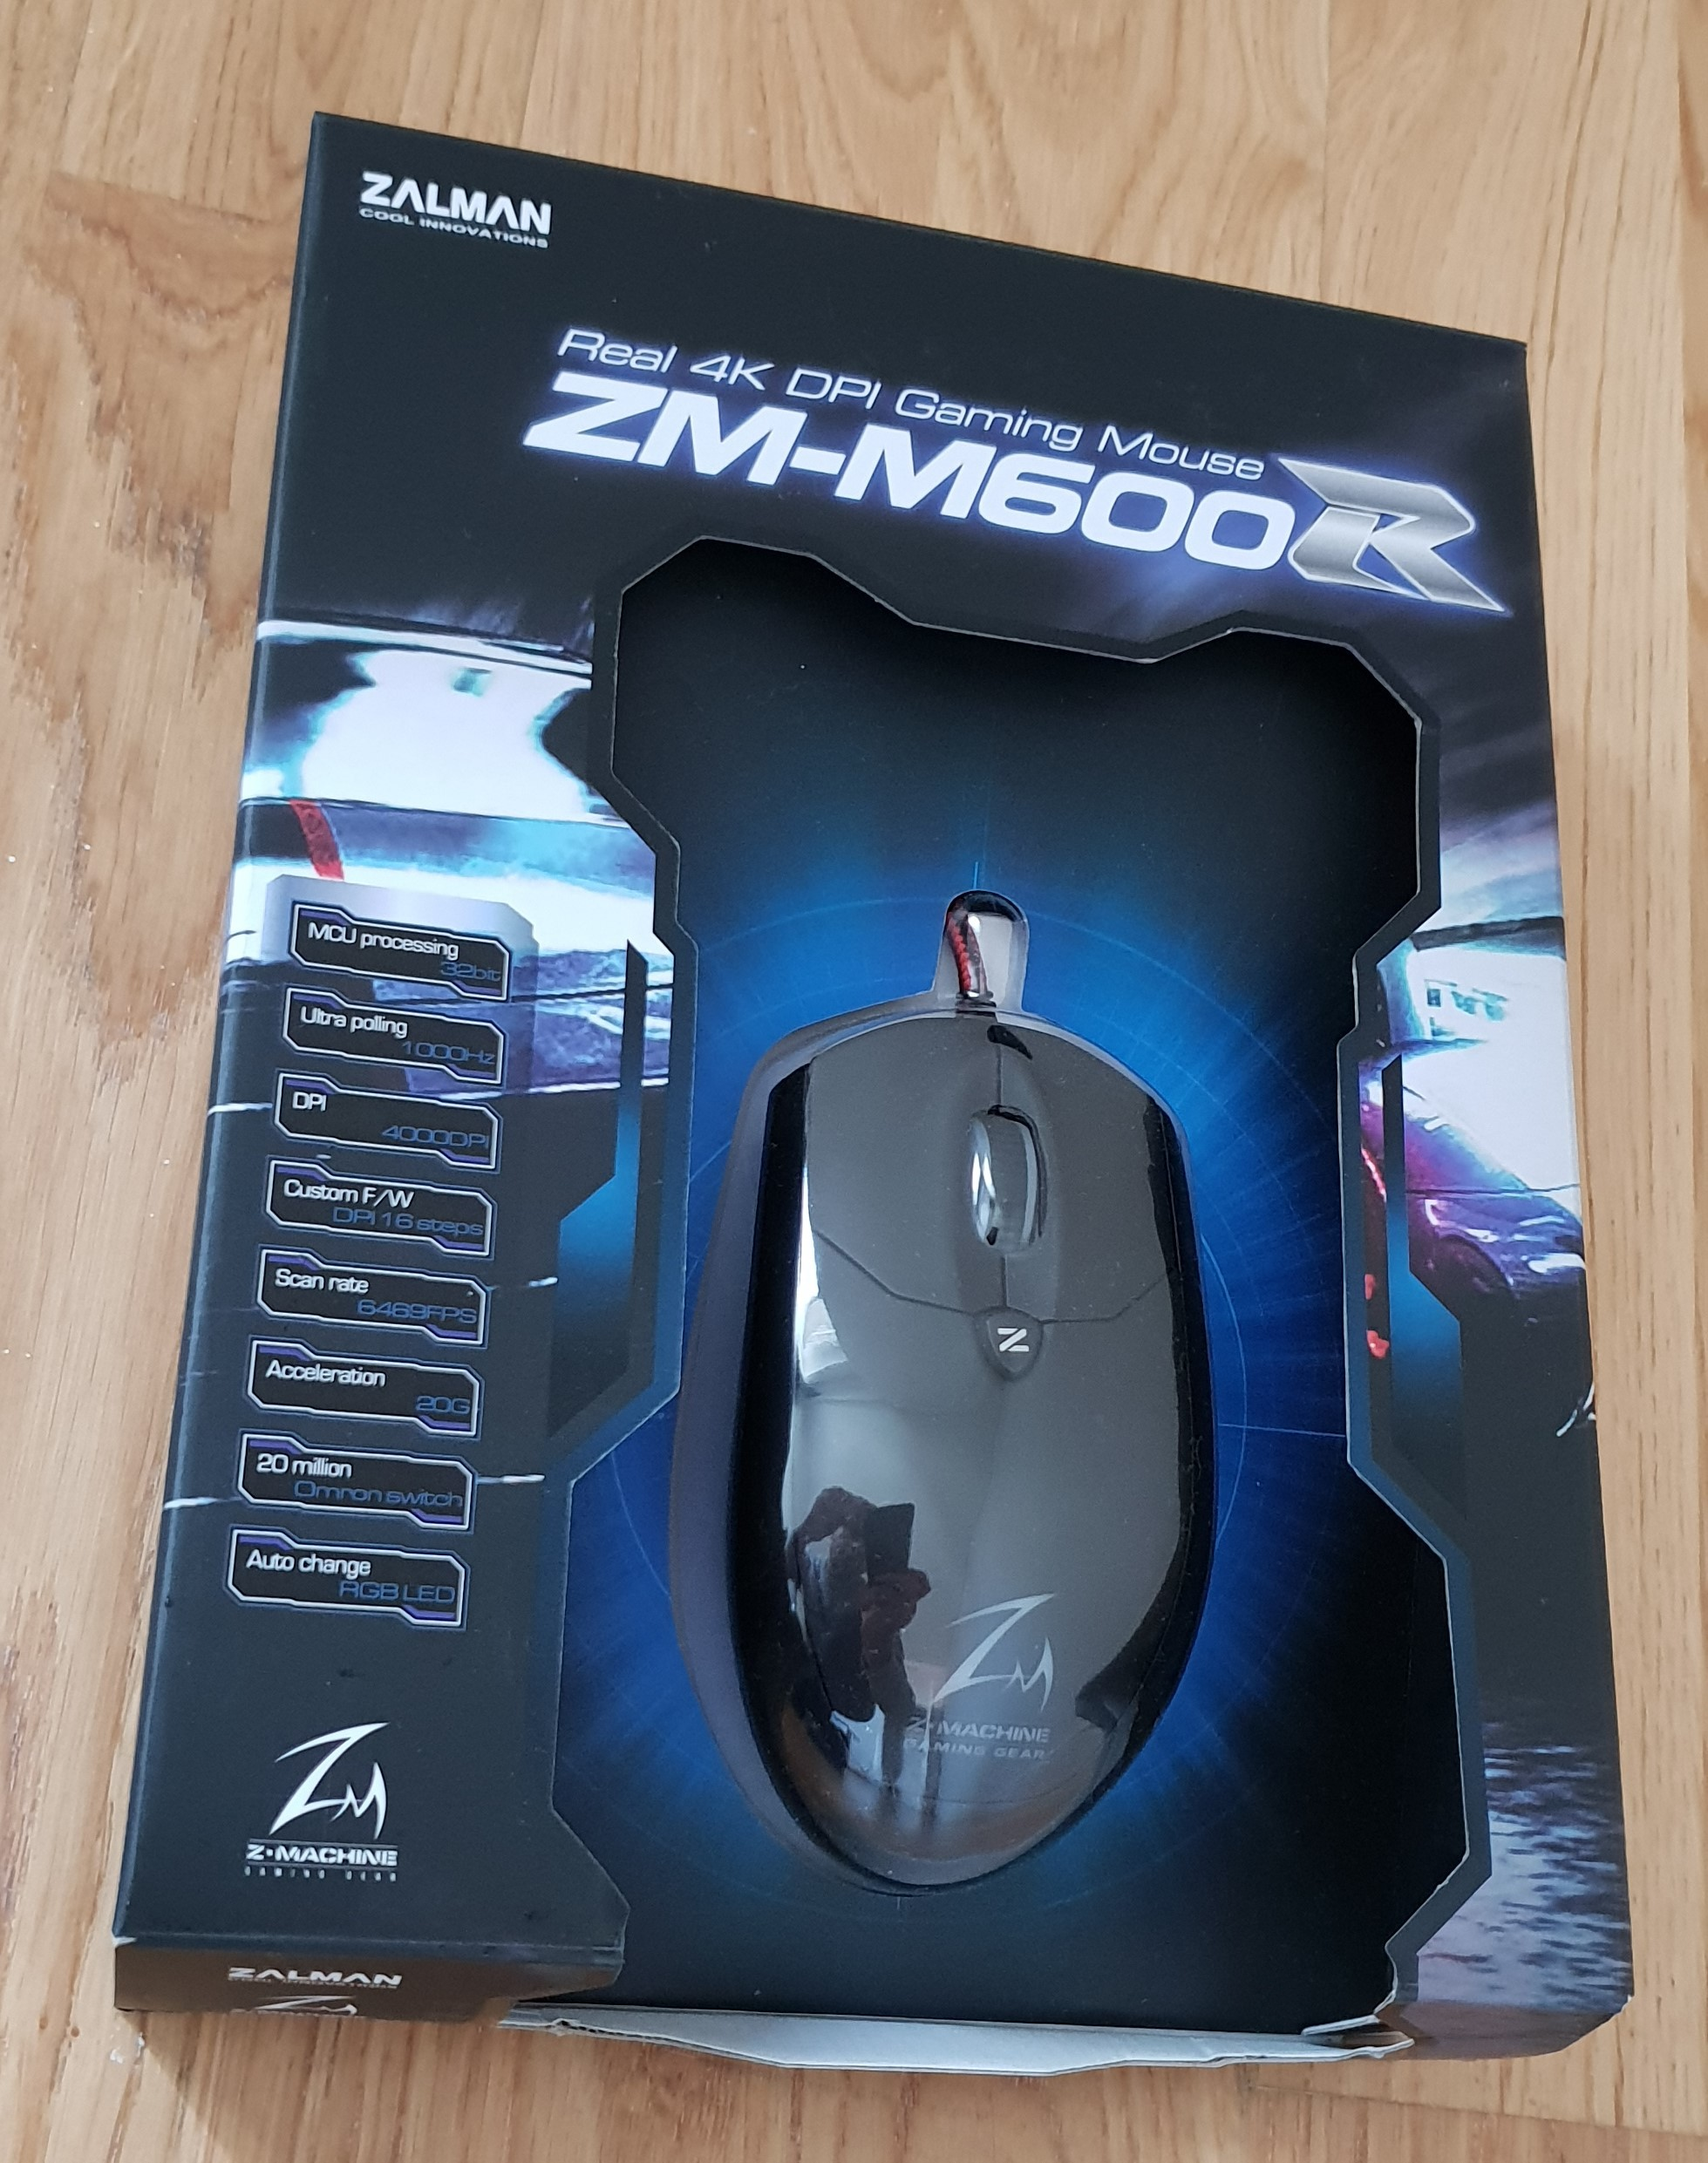 yeni logitech G303 & Asus ROG sica & Zalman ZM M600R Oyuncu faresi Sayfa 1 1